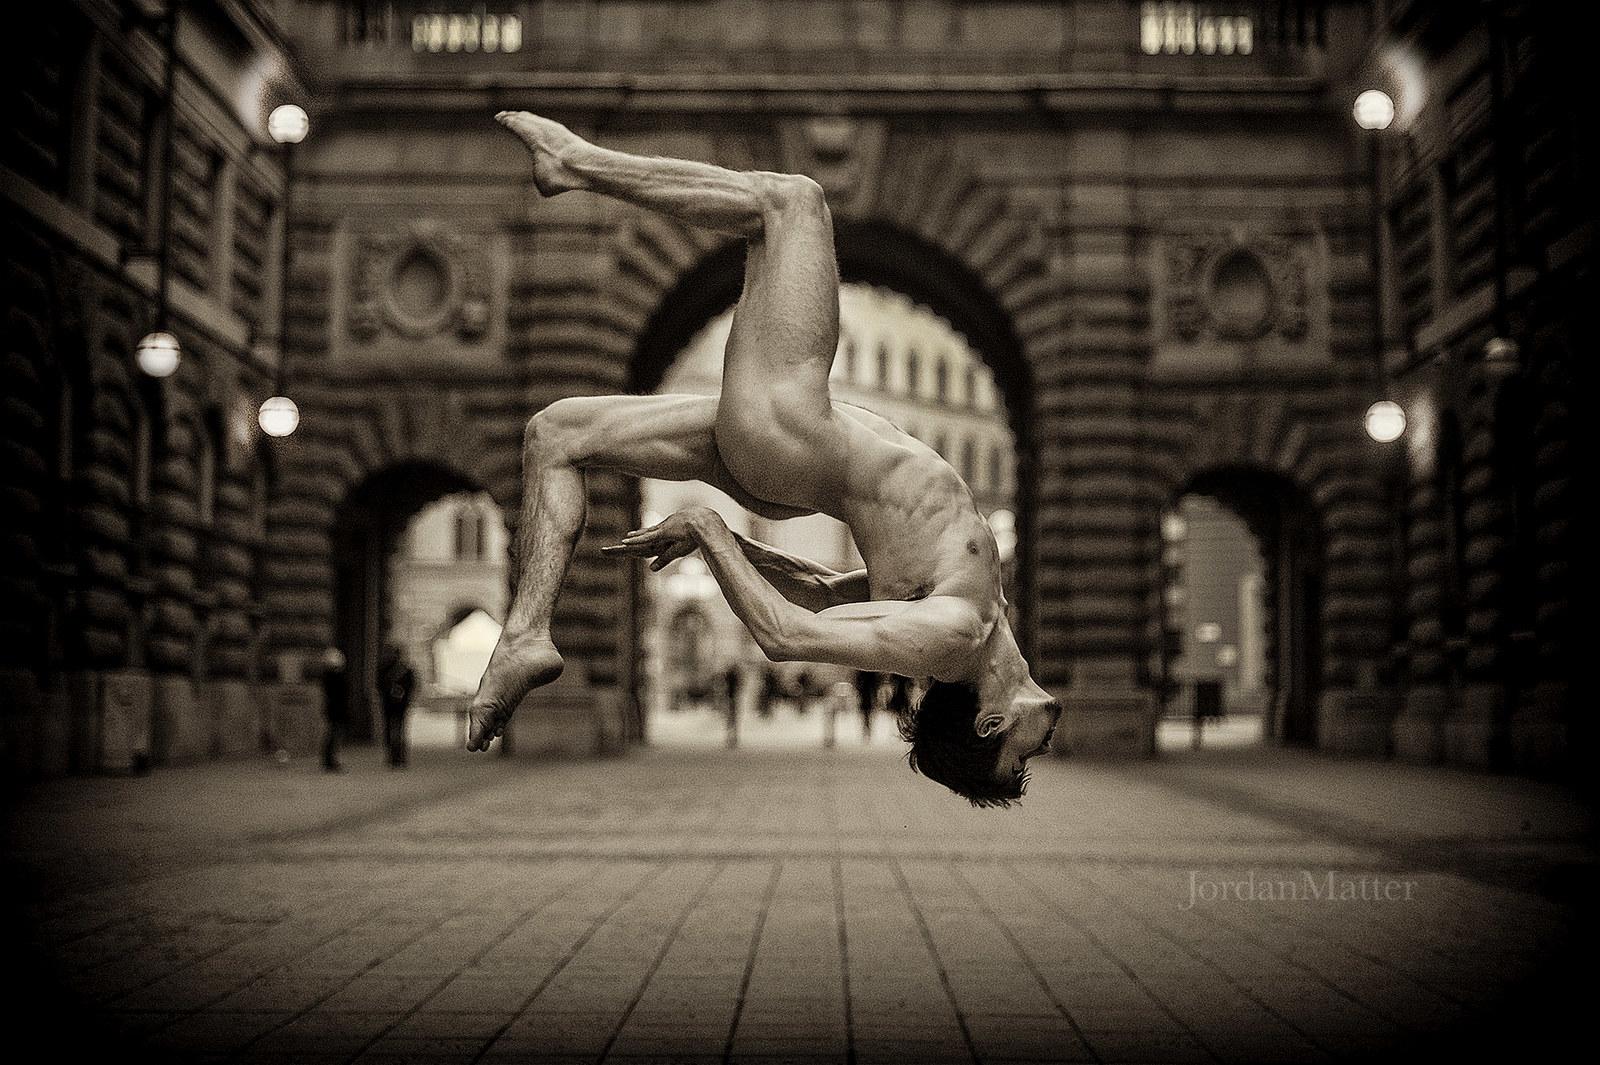 кисти него джордан маттер фото с балеринами этих сур